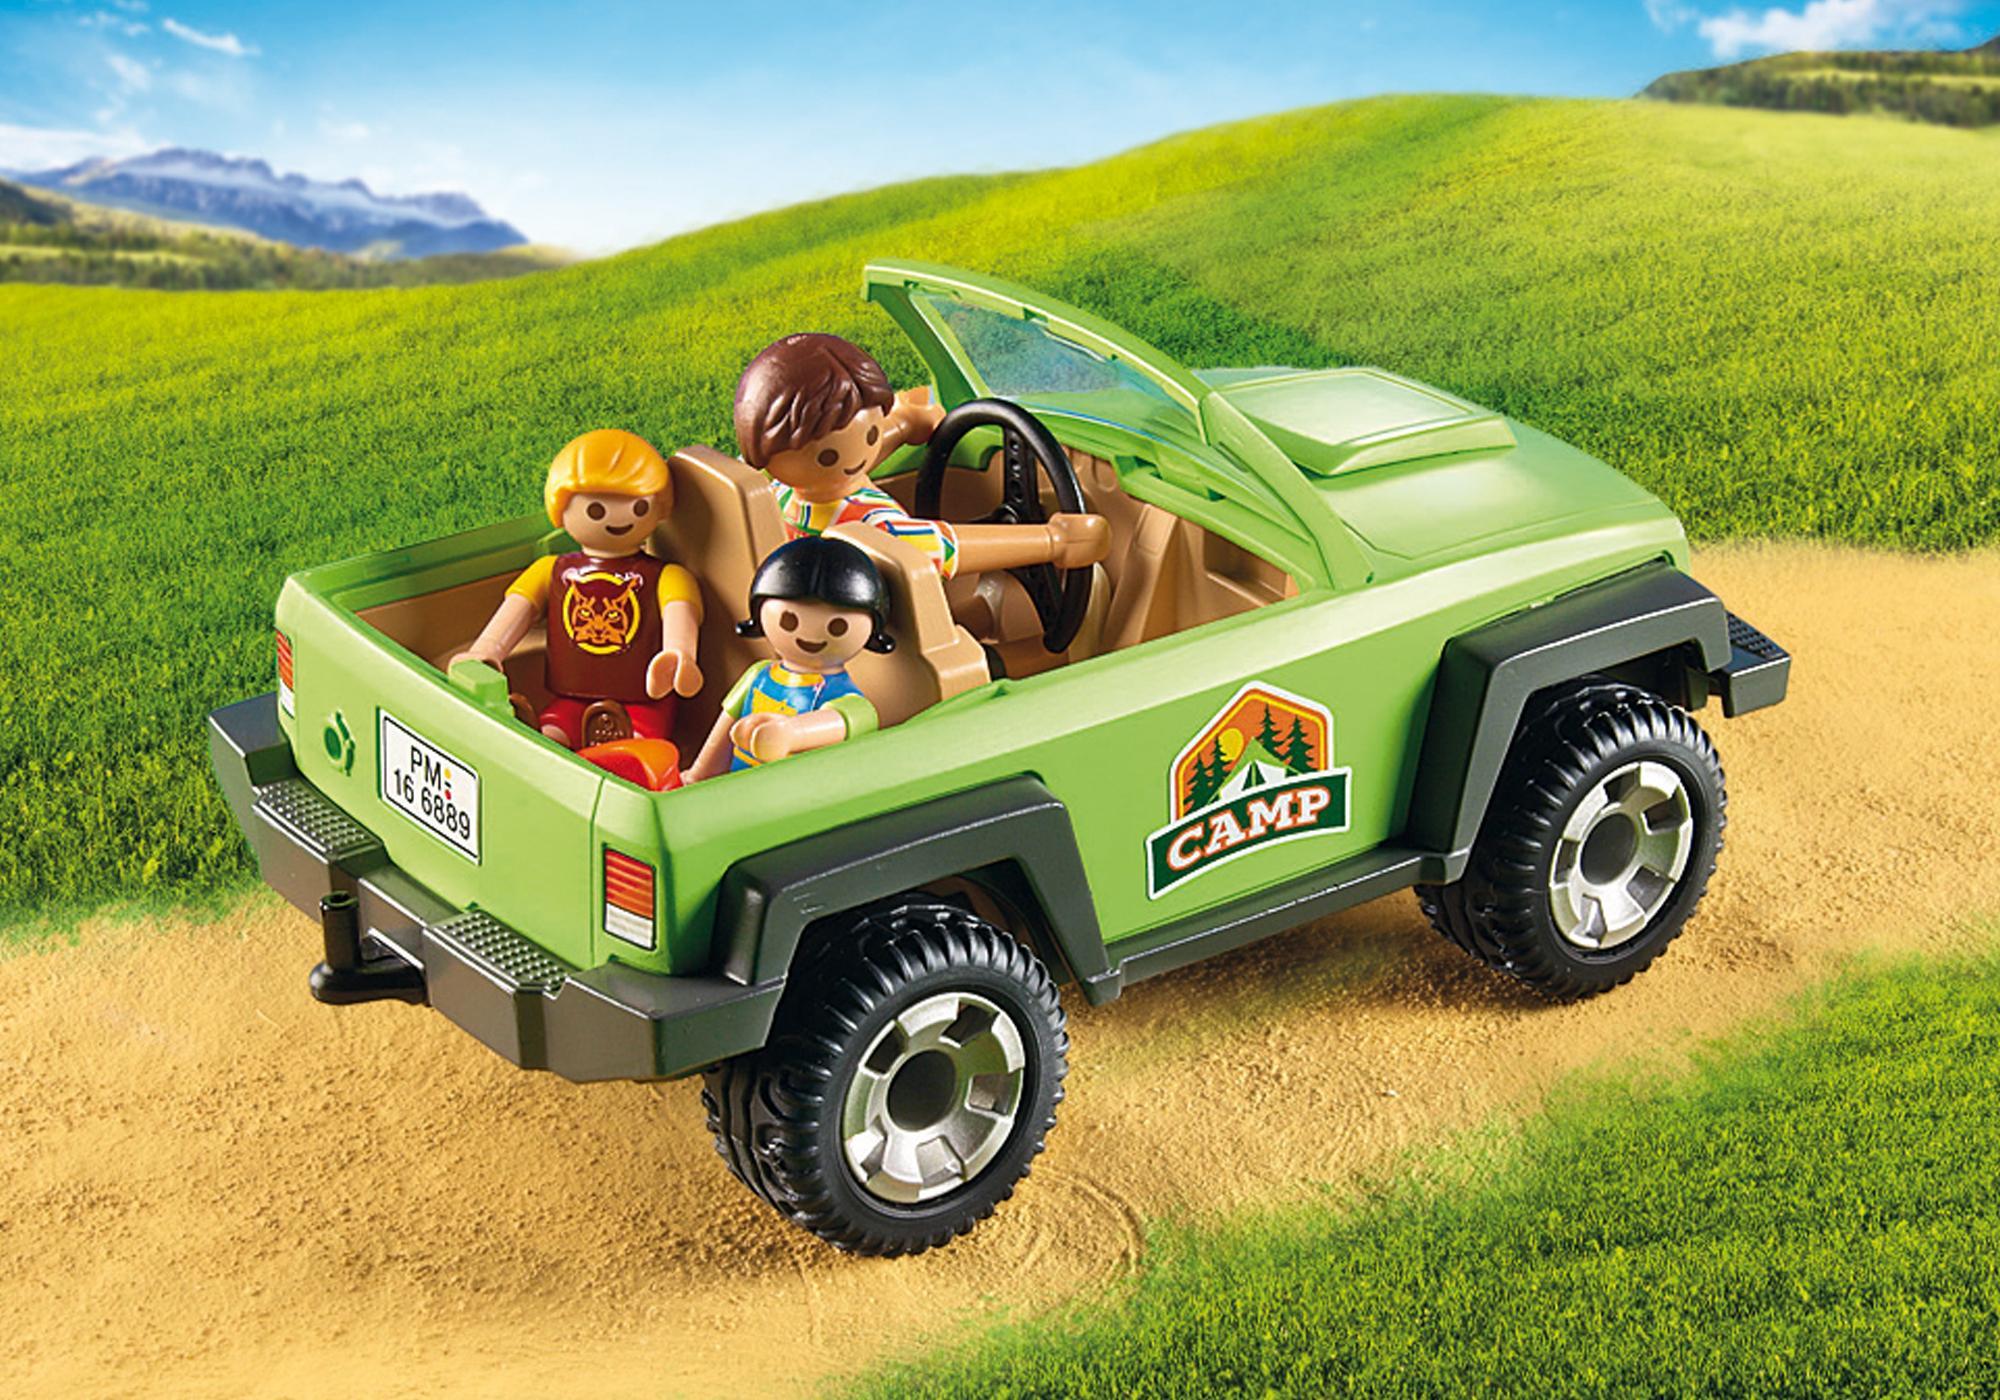 http://media.playmobil.com/i/playmobil/9154_product_extra2